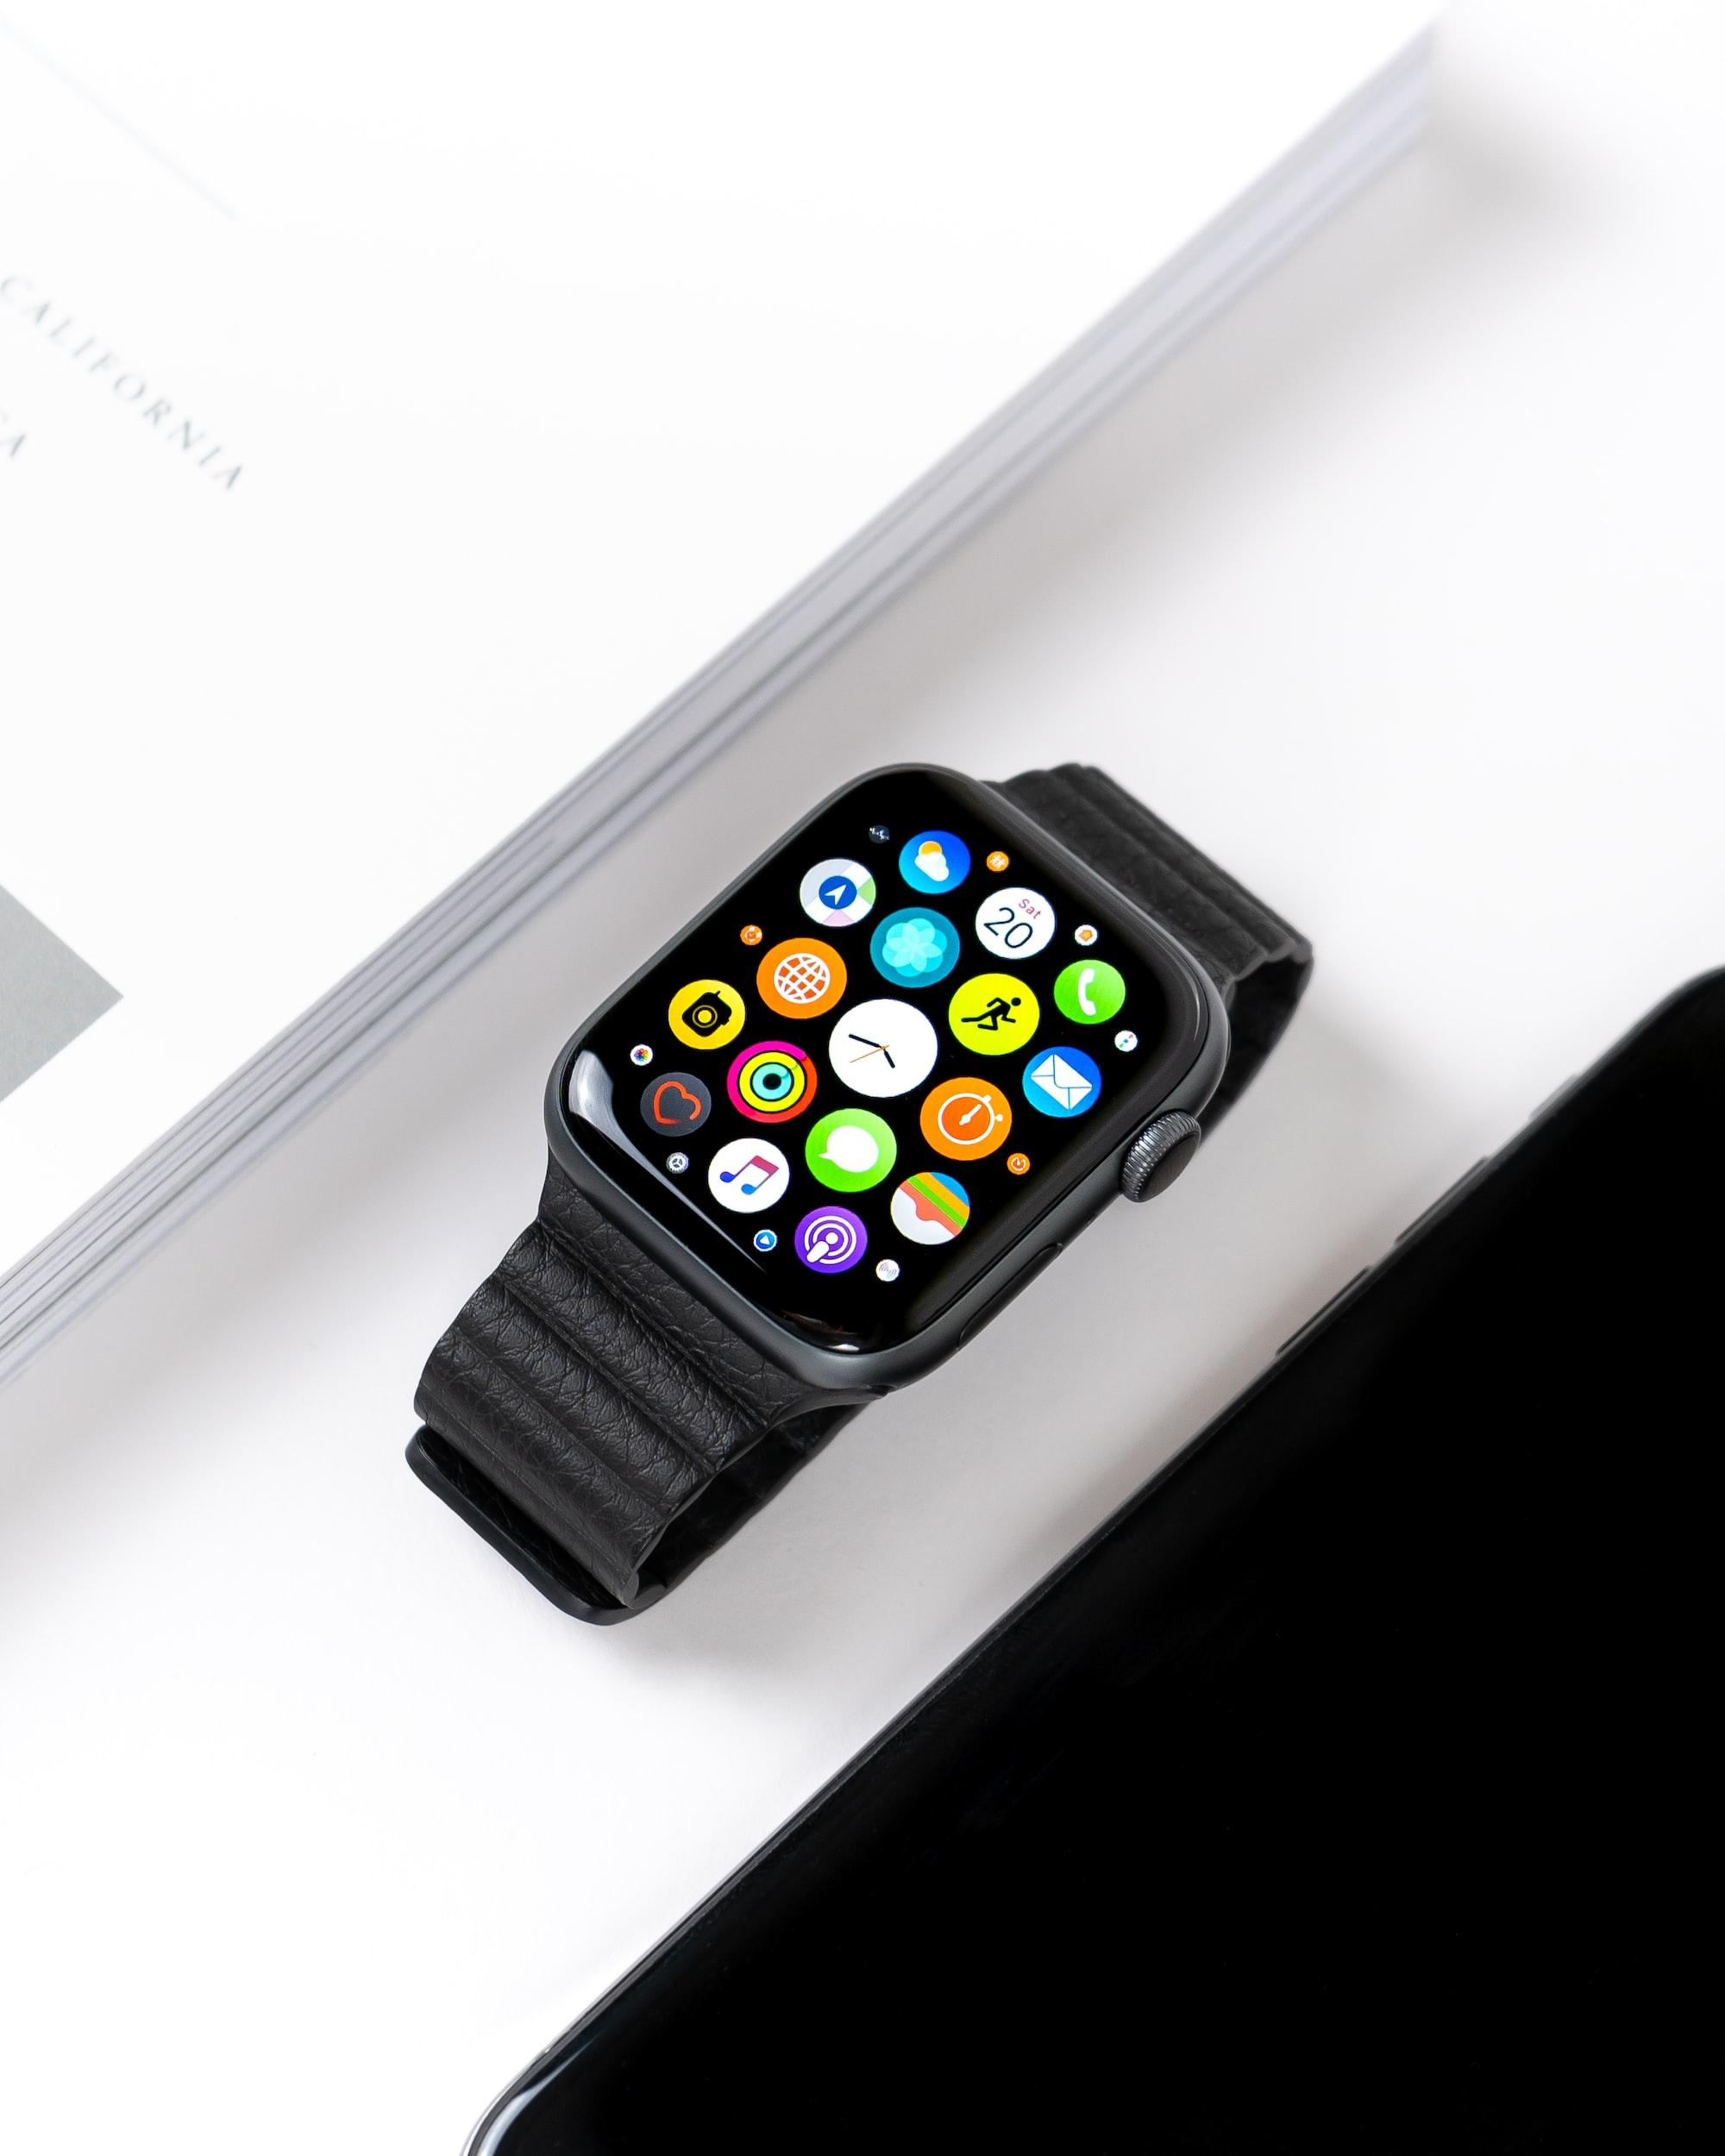 Apple Watch Looks Good